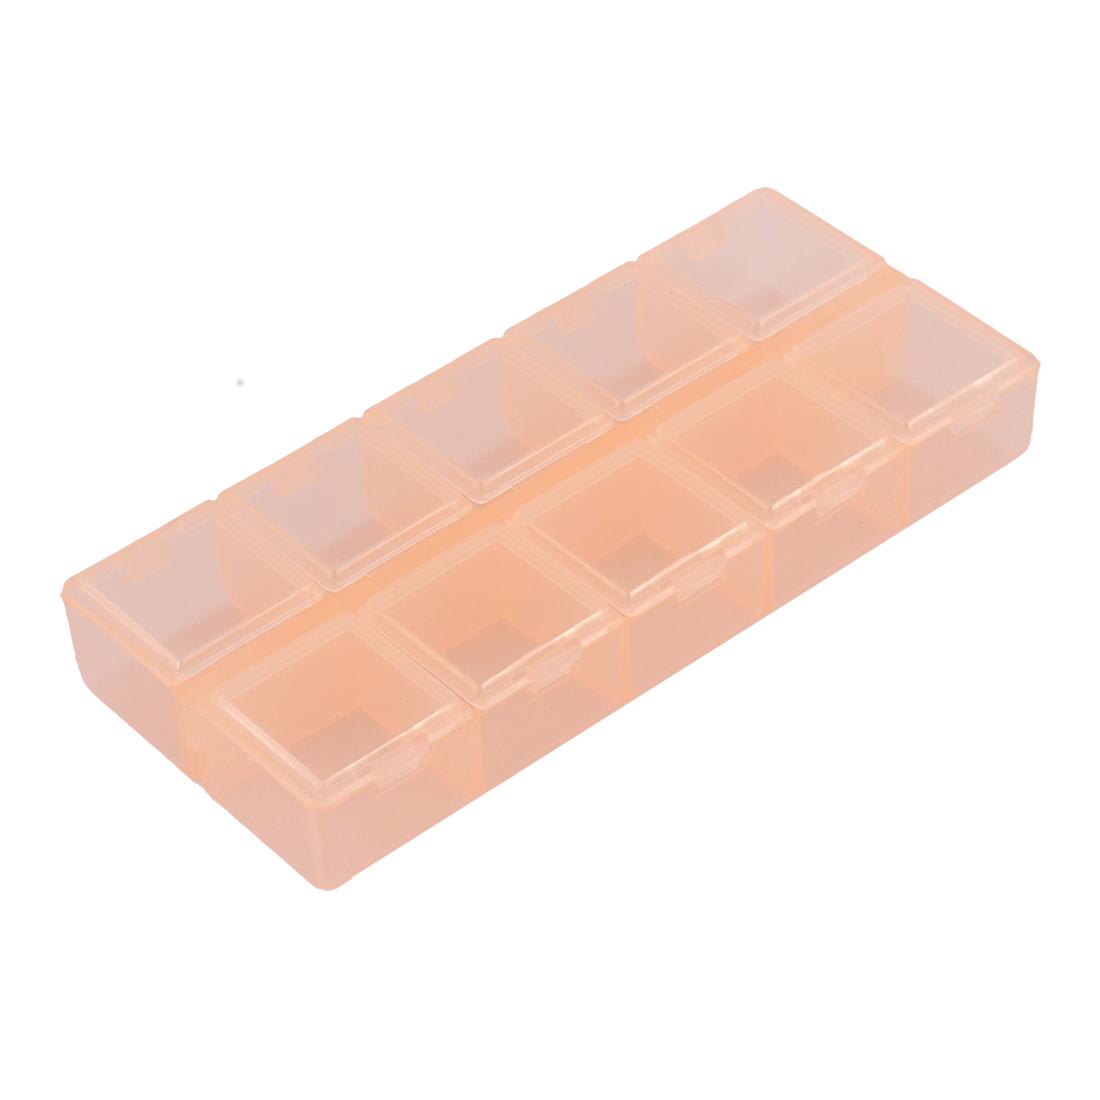 Jewelry Pills Plastic 10 Slots Storage Case Box Organizer Container Clear Orange